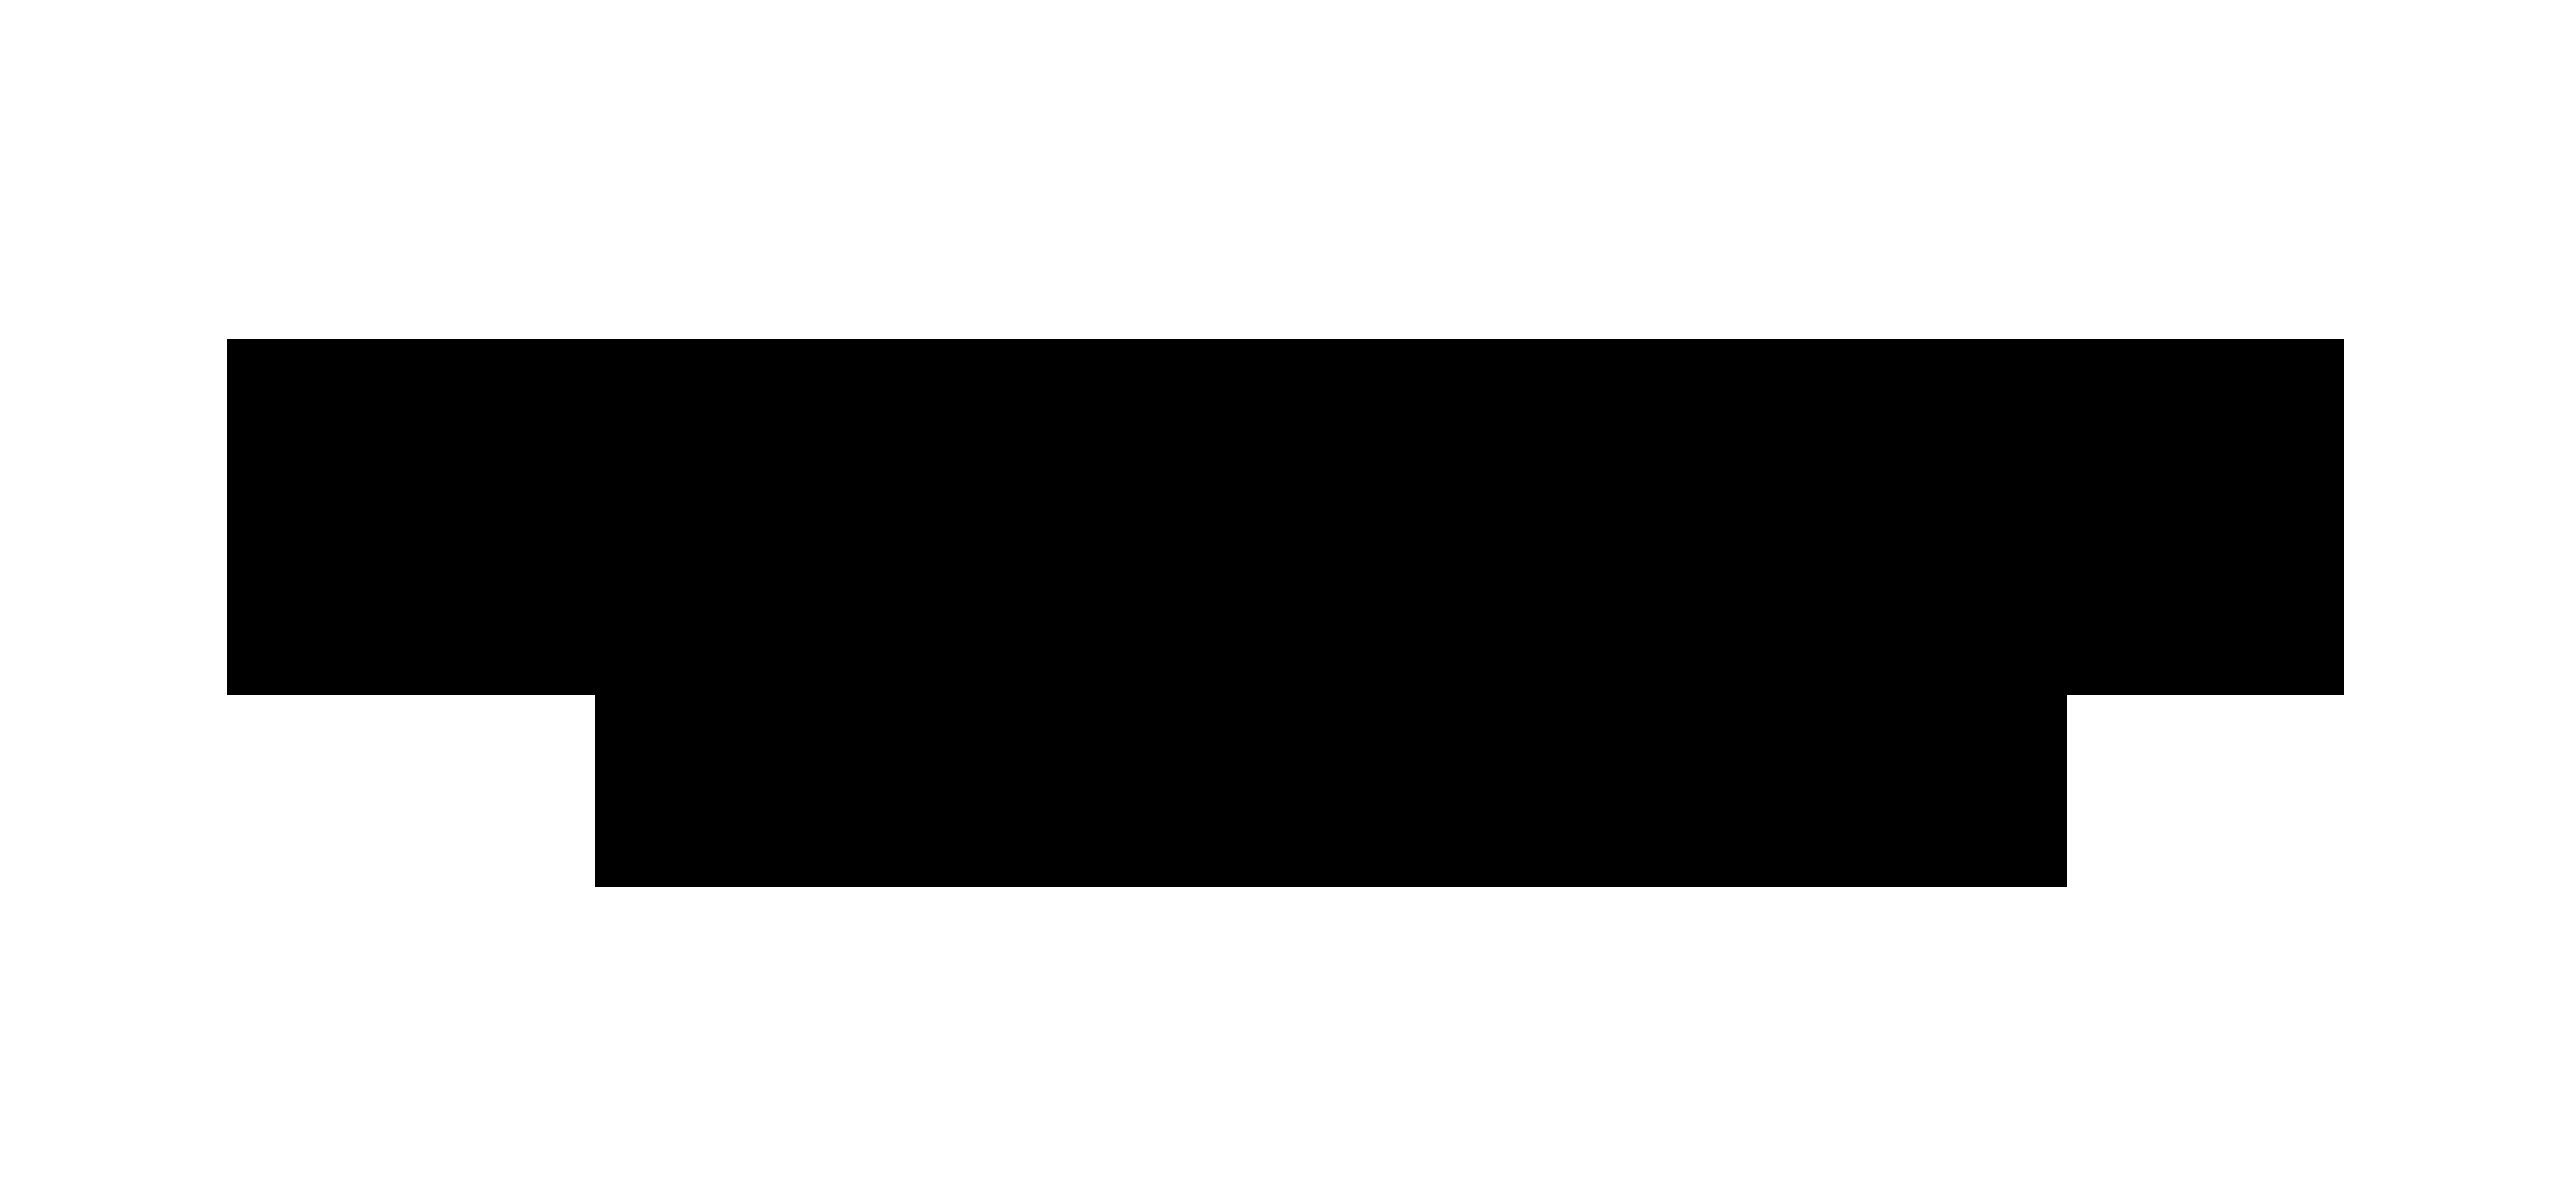 taller salamanca - Portfolio